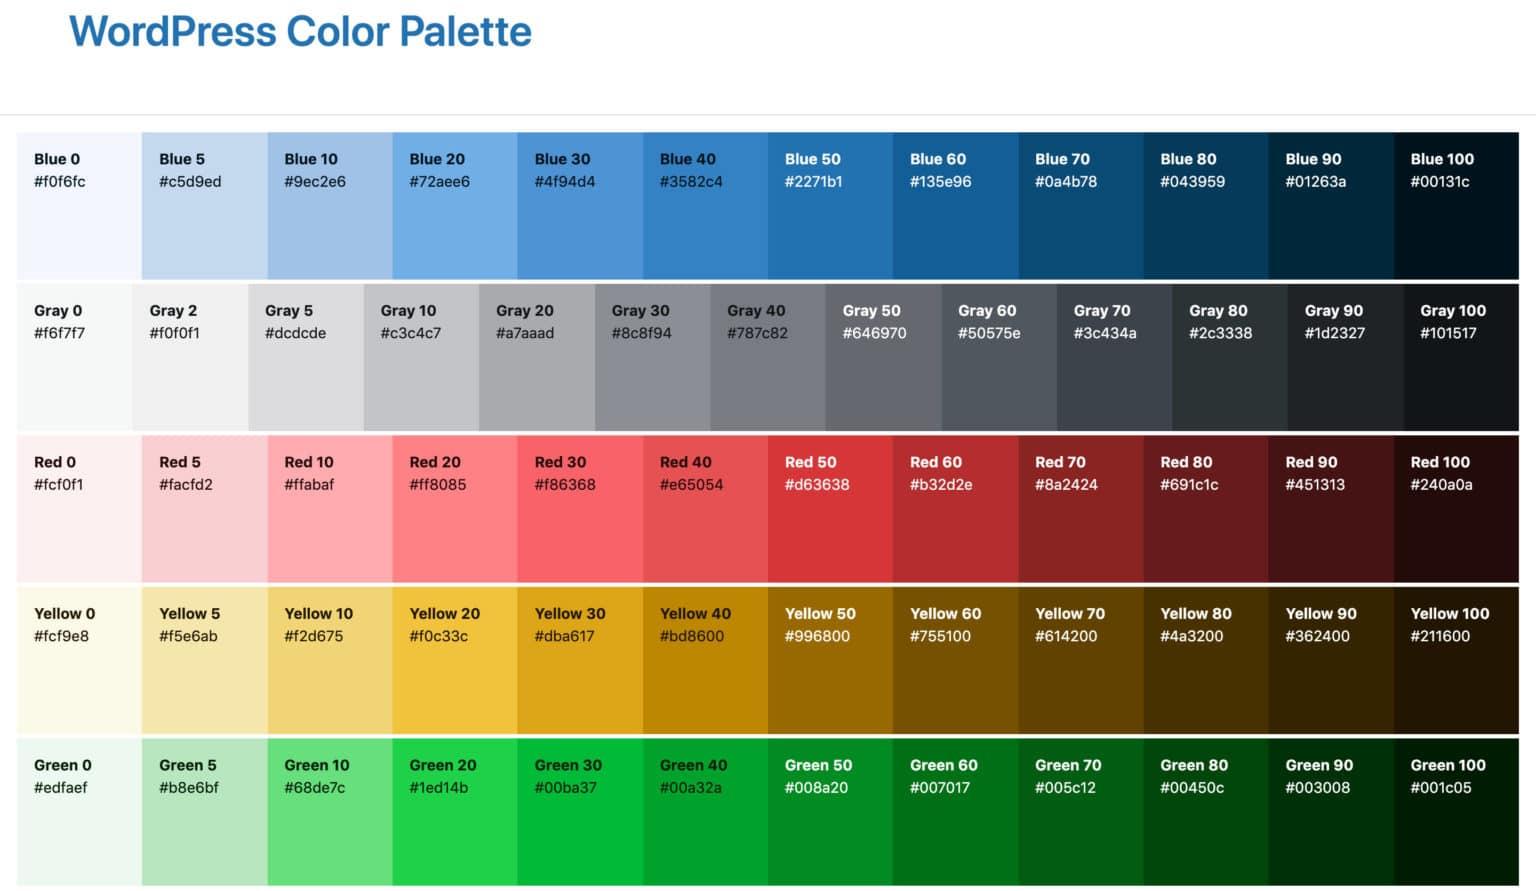 WordPress Color Palette